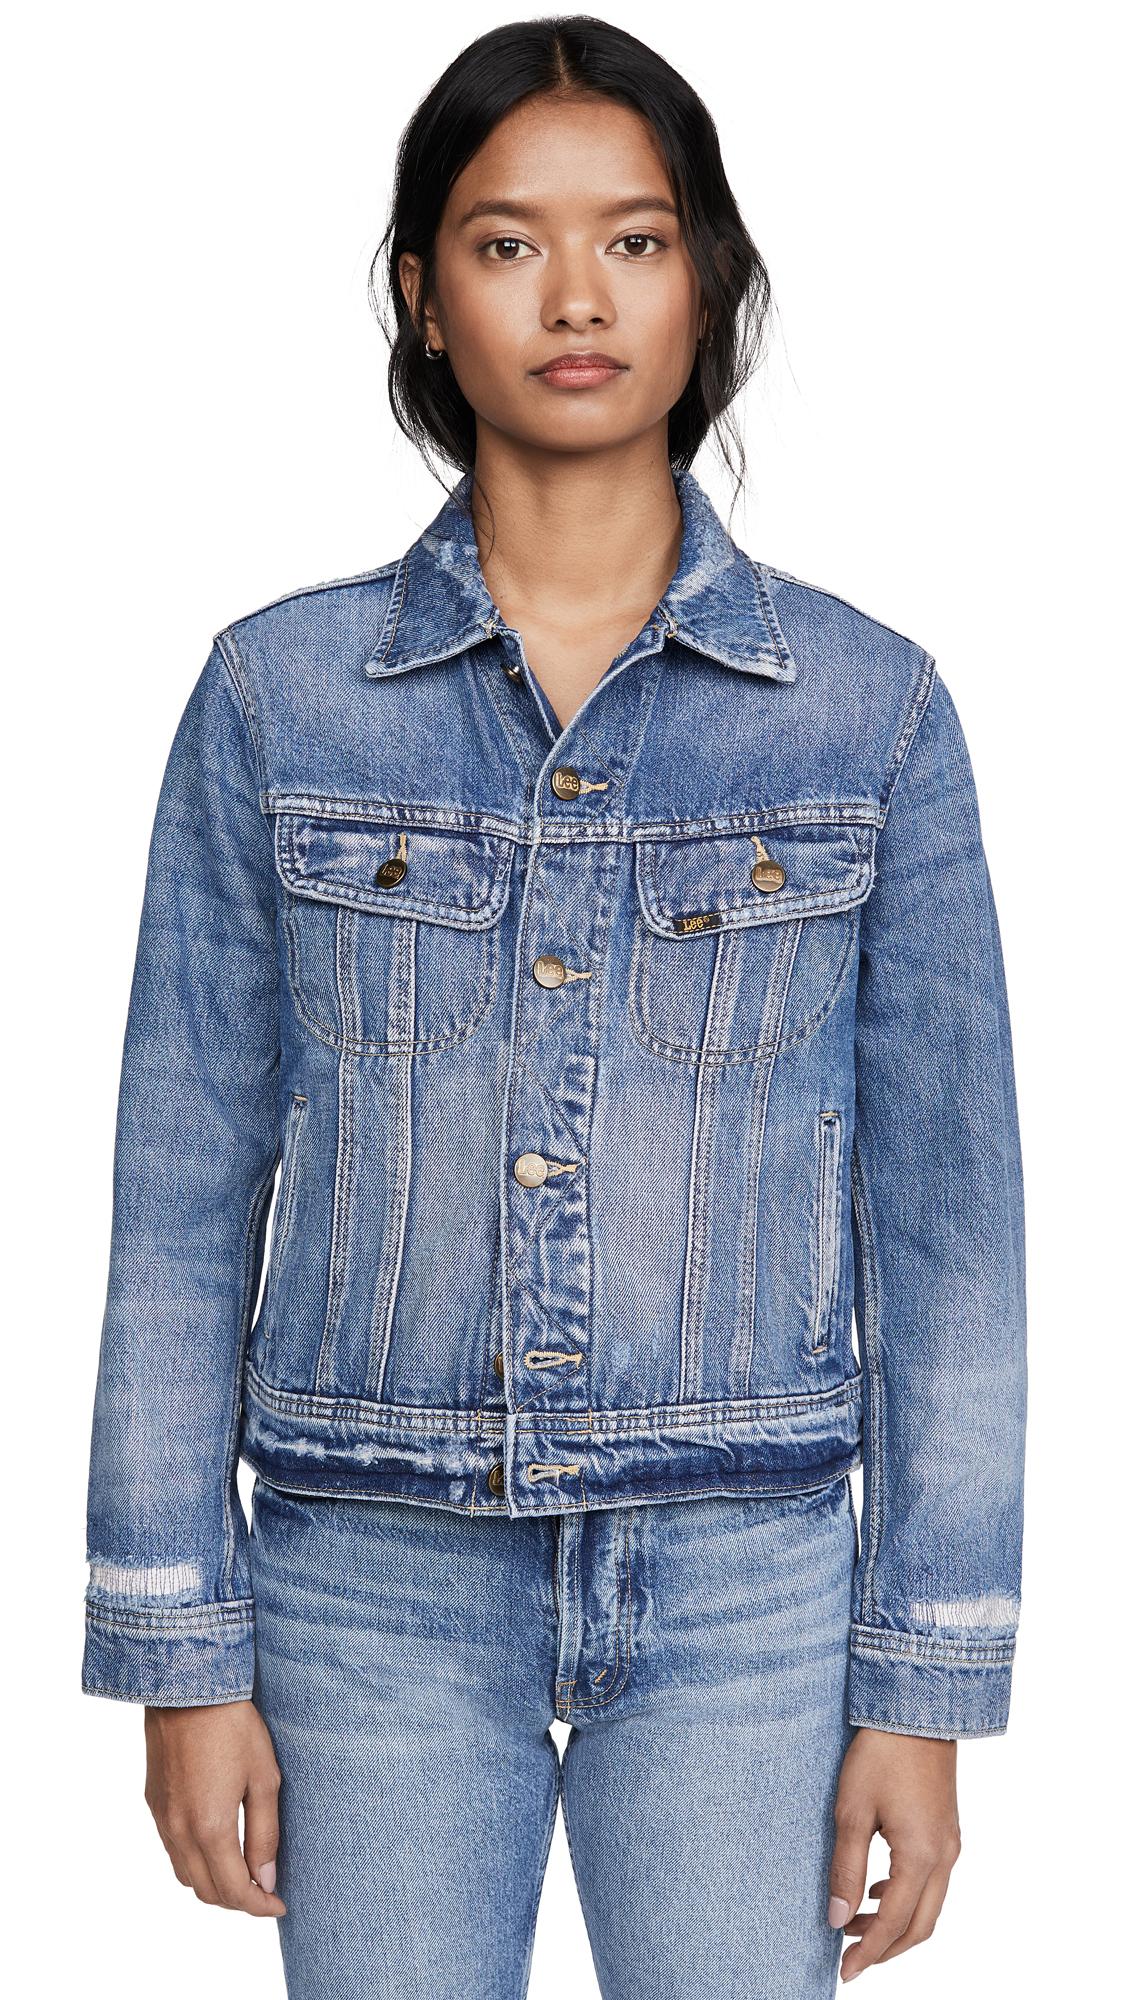 Buy Lee Vintage Modern Rider Jacket online beautiful Lee Vintage Modern Clothing, Jackets